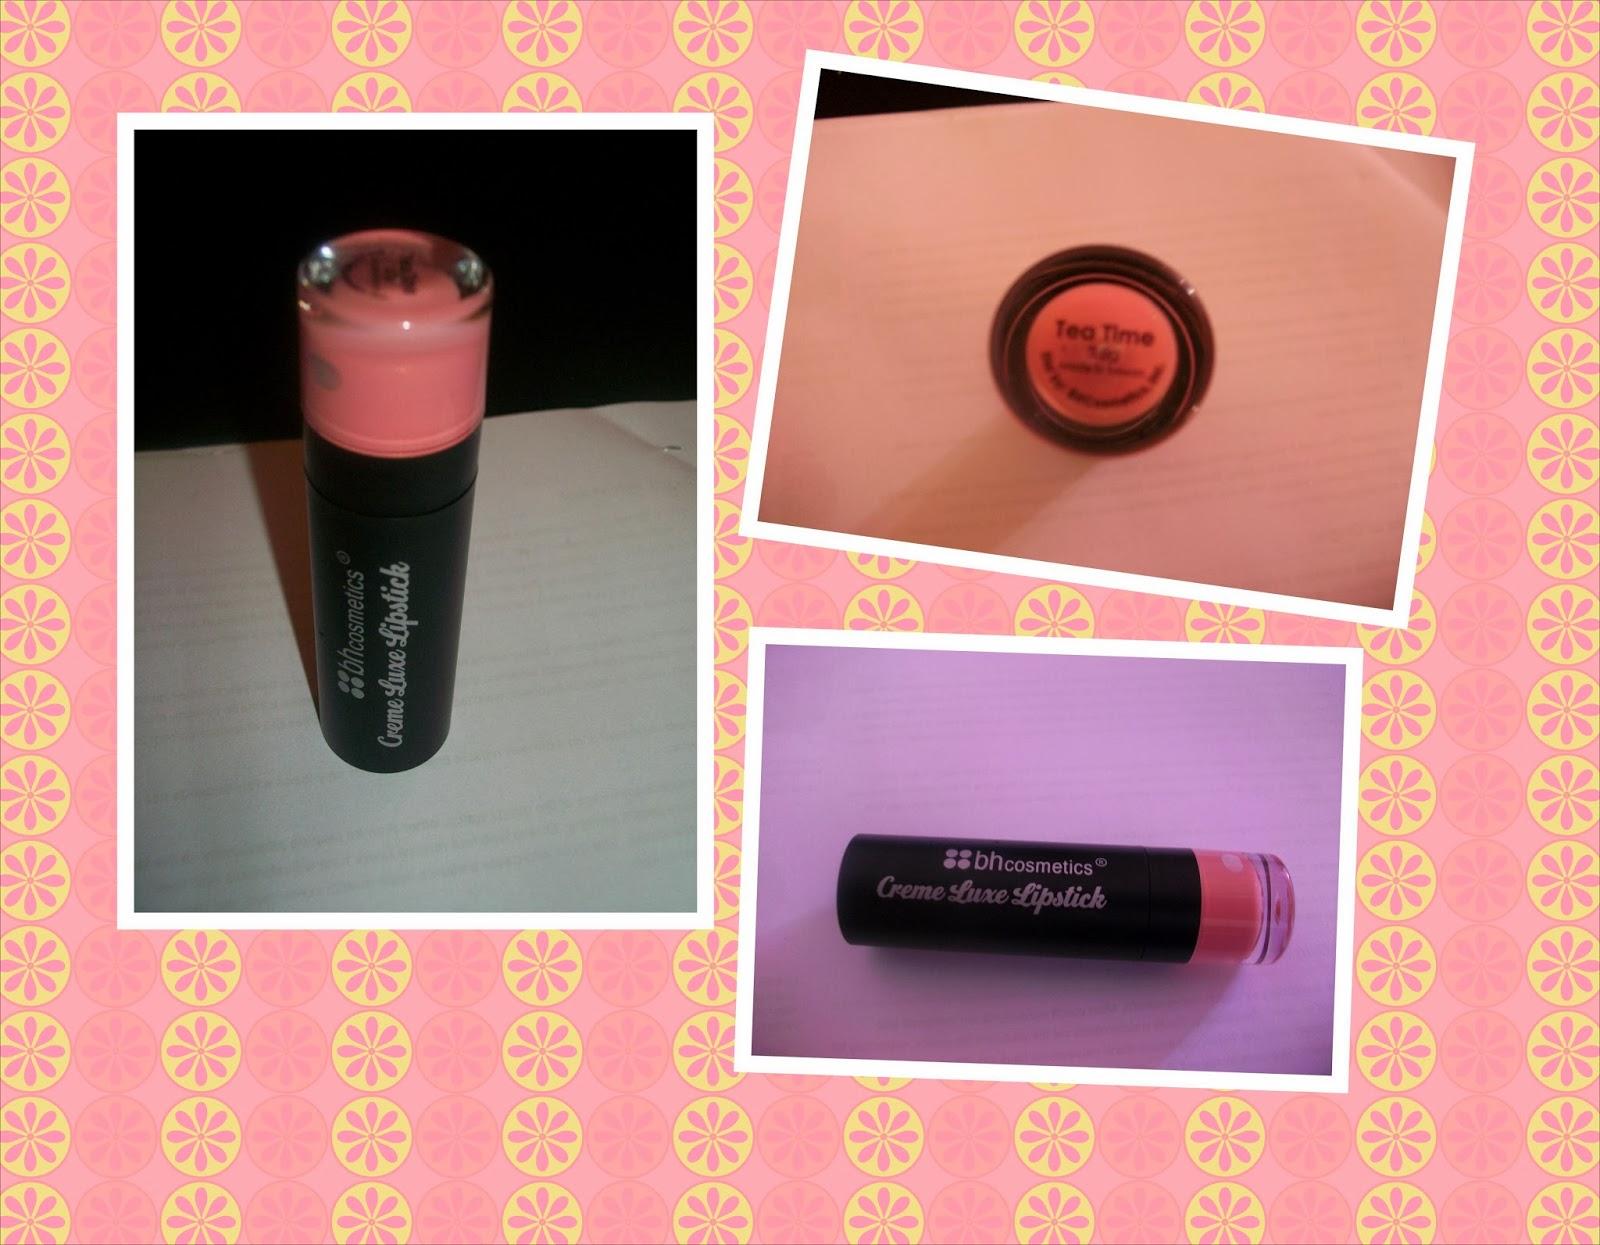 Bh cosmetics creme luxe lipstick bundle   Lipstick bundles